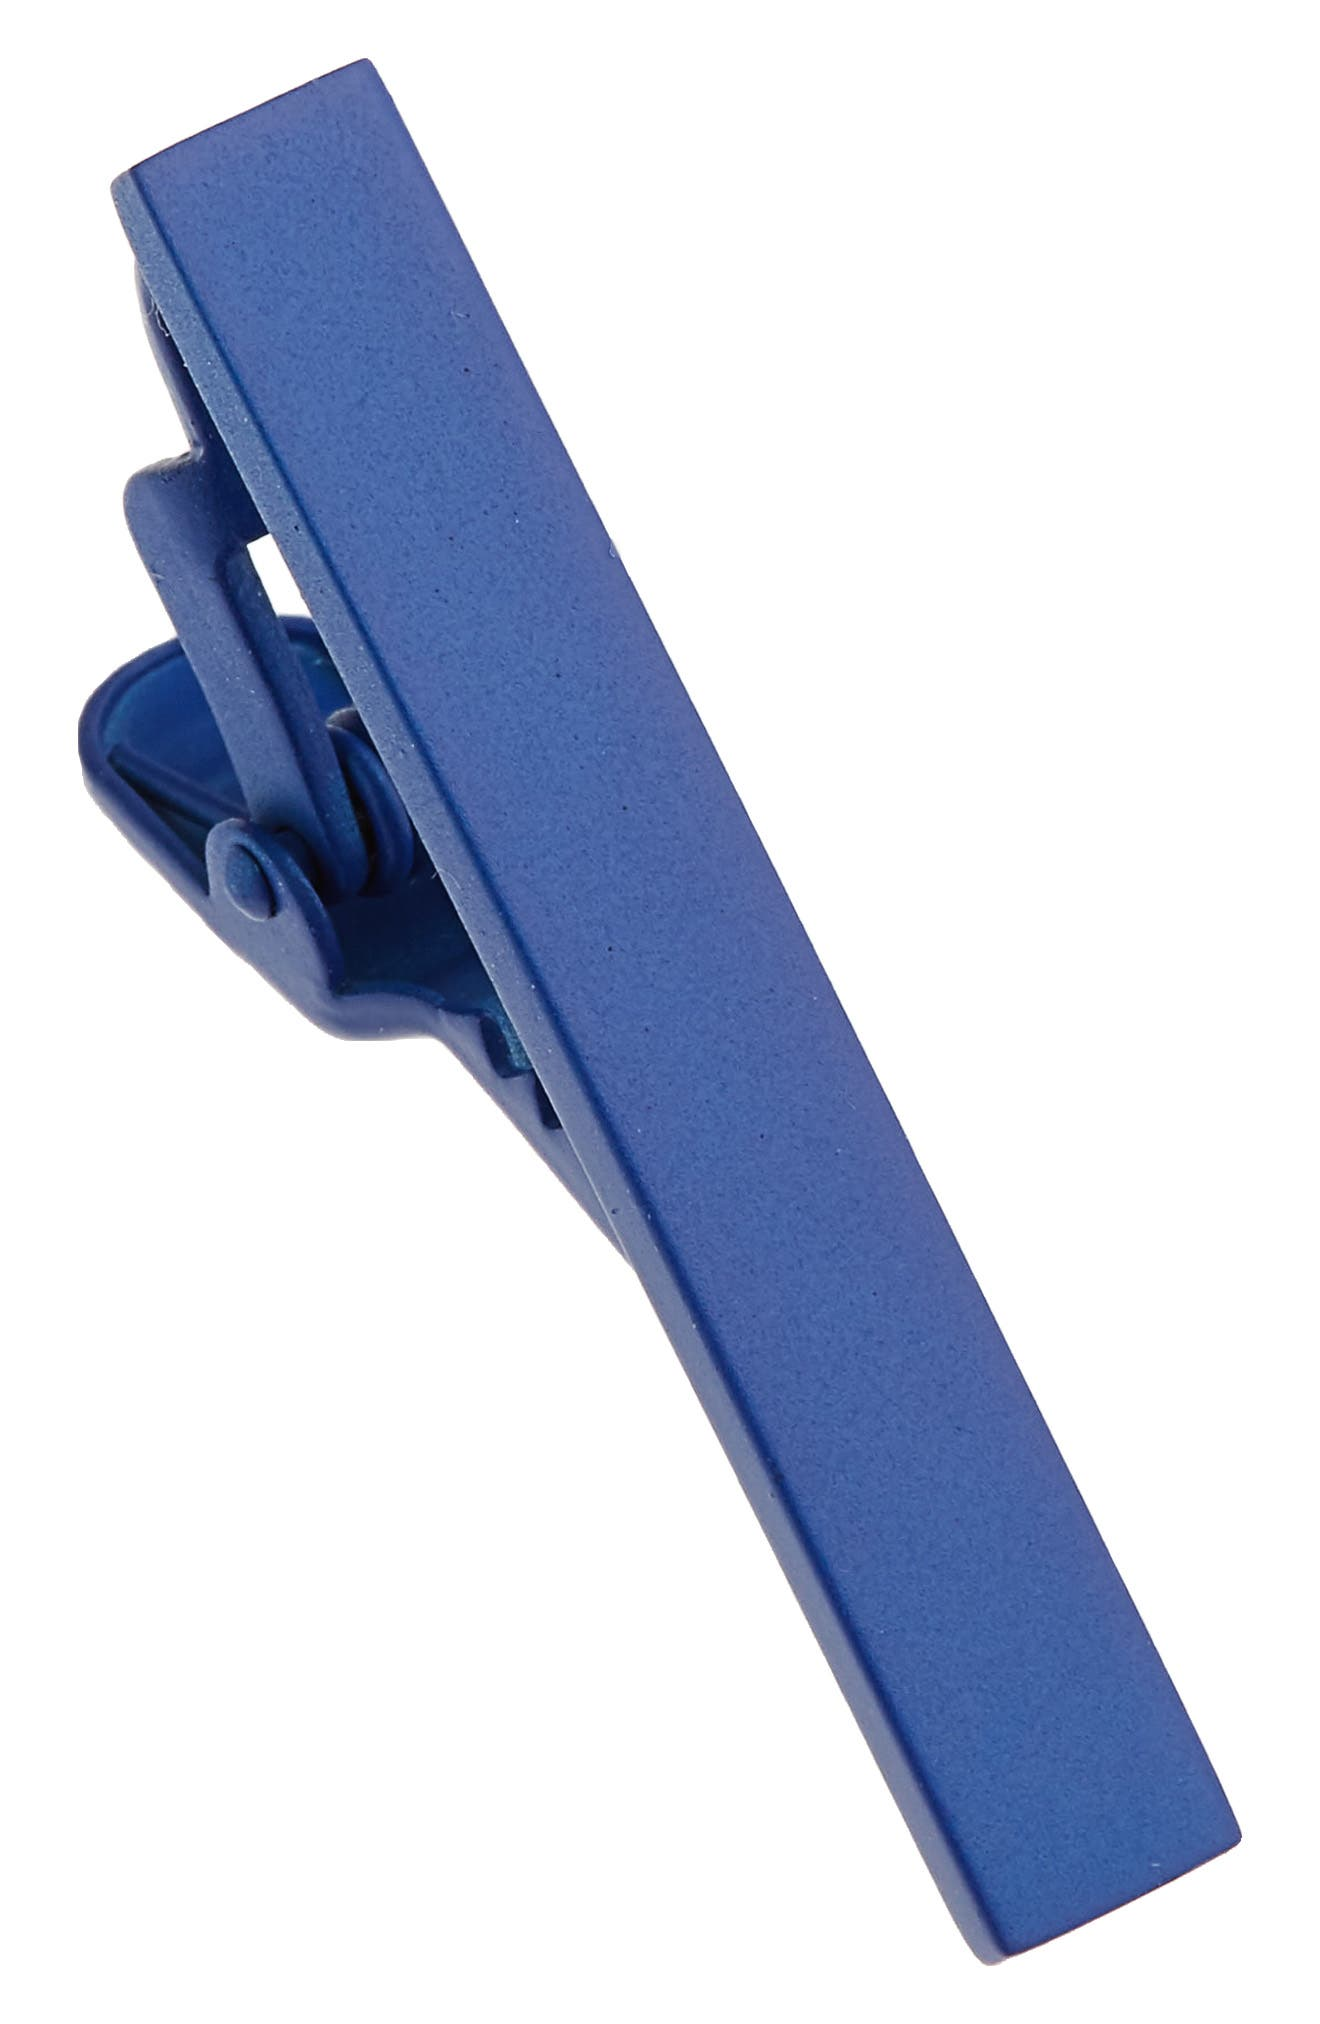 Main Image - The Tie Bar Matte Tie Bar